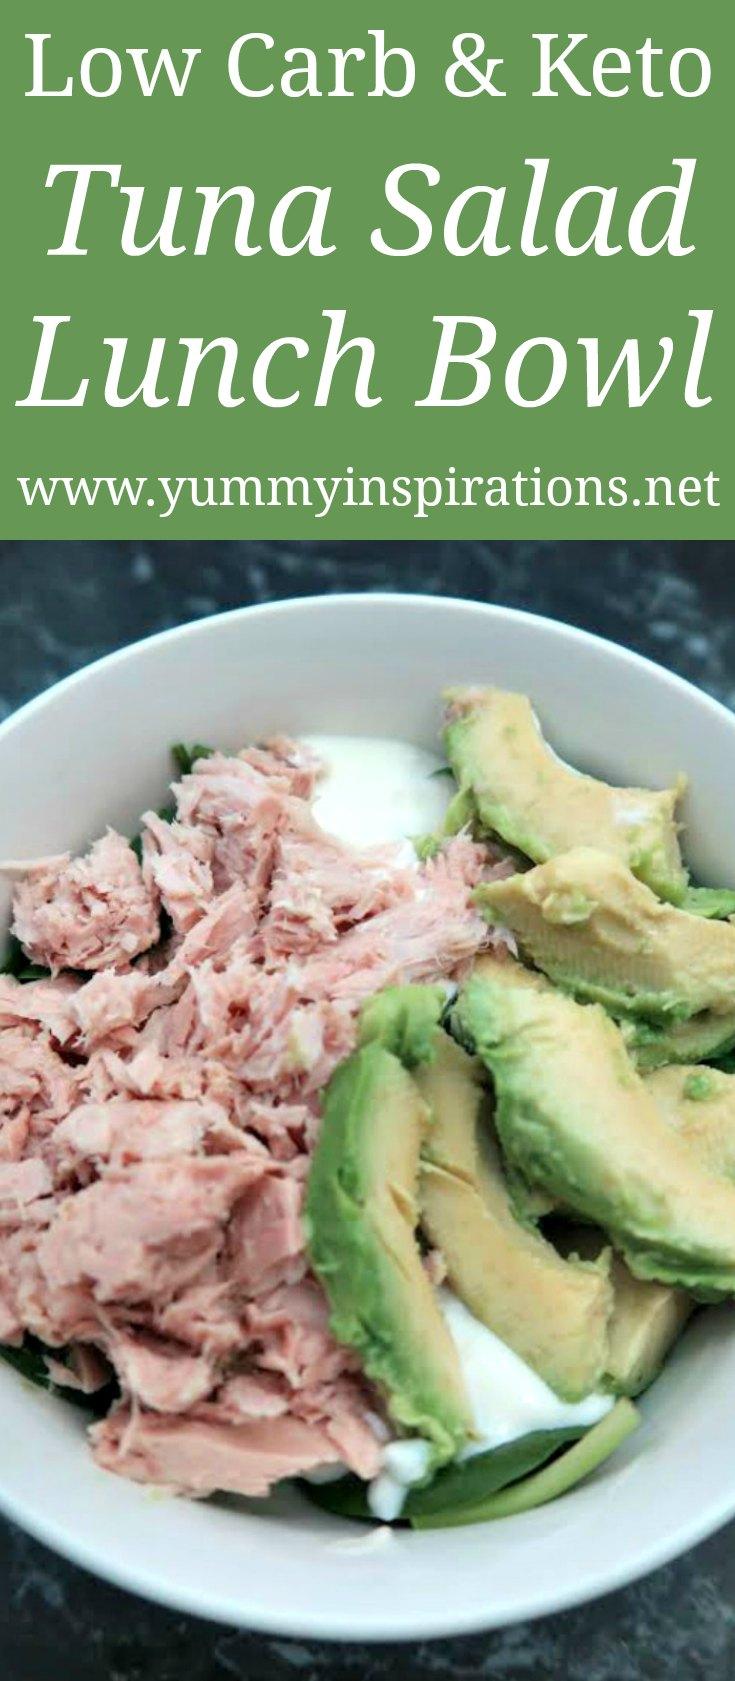 Low Carb Tuna Salad Lunch Bowl Recipe - easy keto lunch ideas